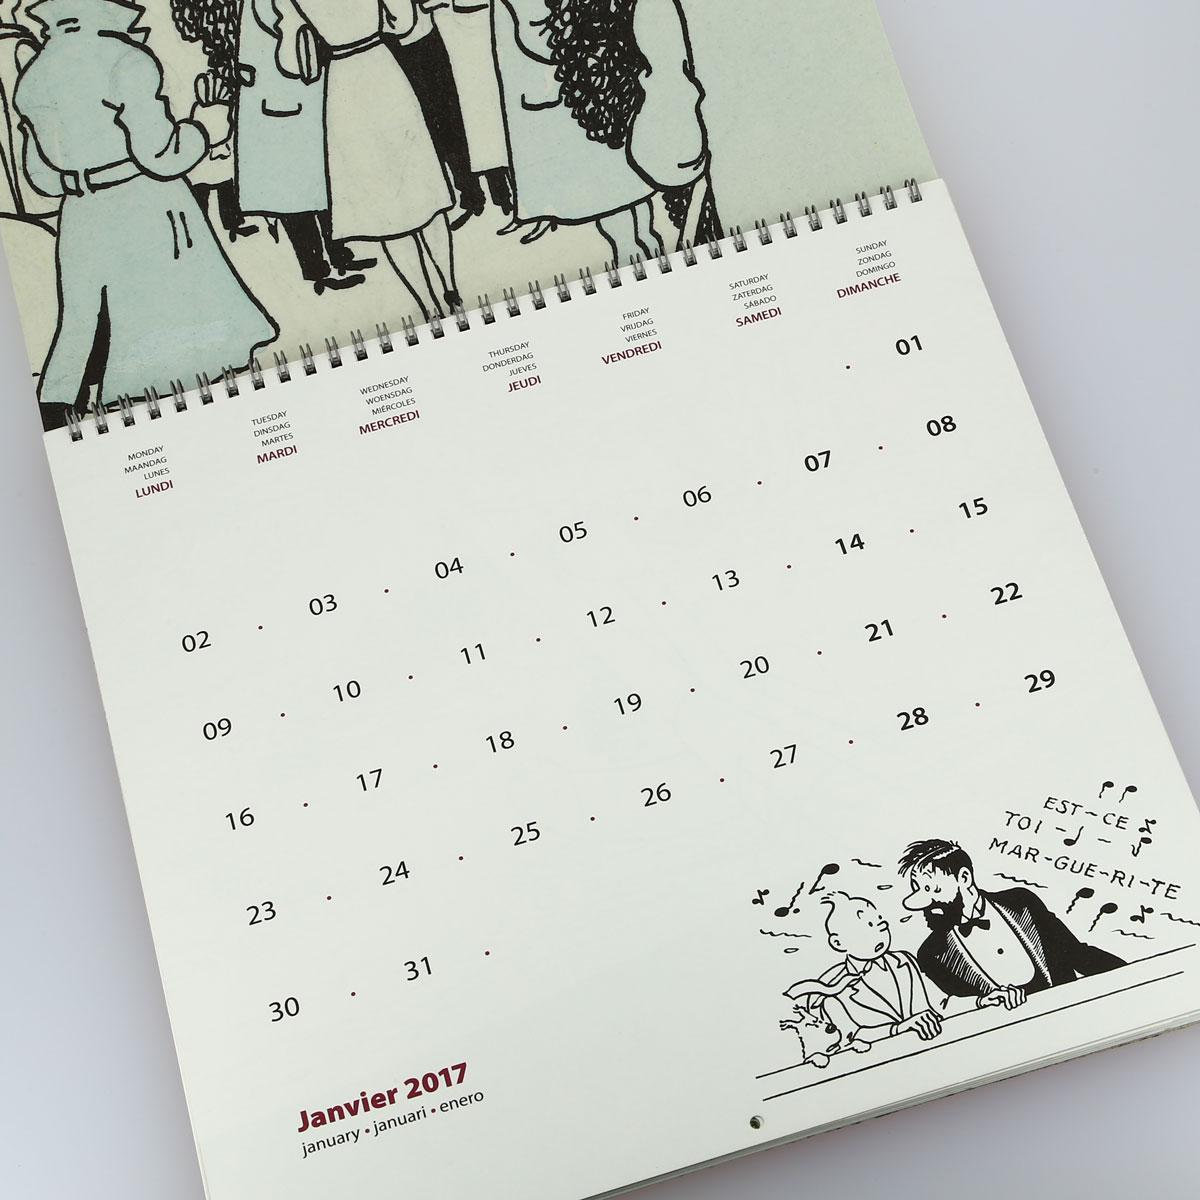 Tintin l 39 art d 39 herge grand calendrier 2017 30 x 30 cm Grand calendrier mural 2017